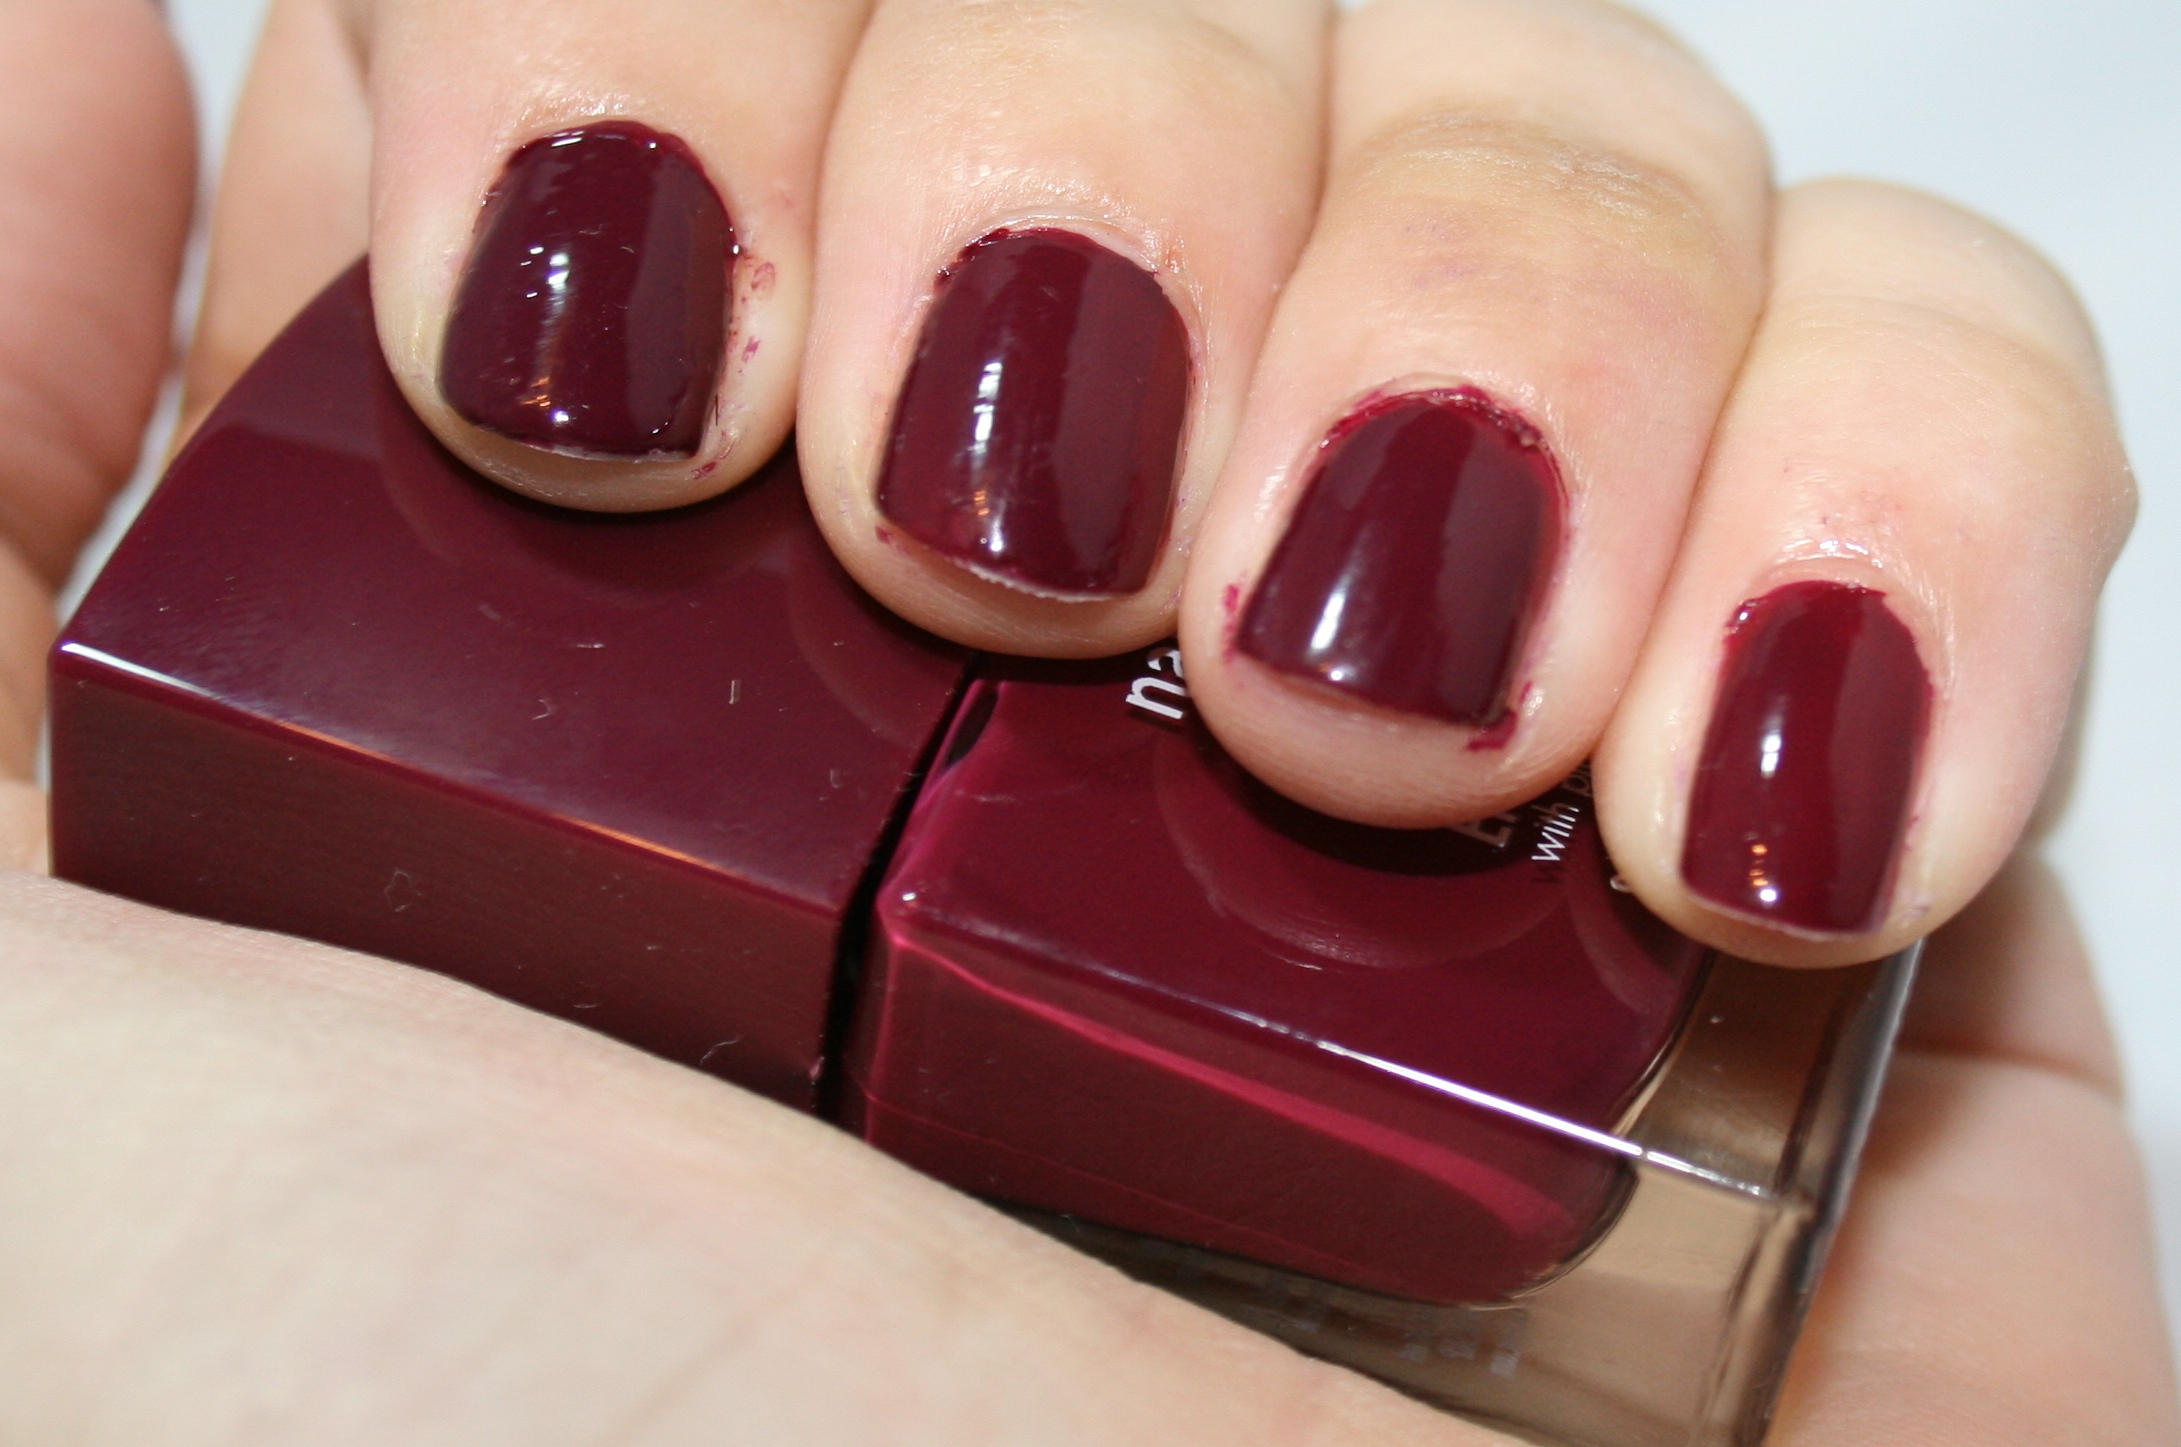 NOTD: Nails Inc Gel Effect Kensington High Street - Beauty Geek